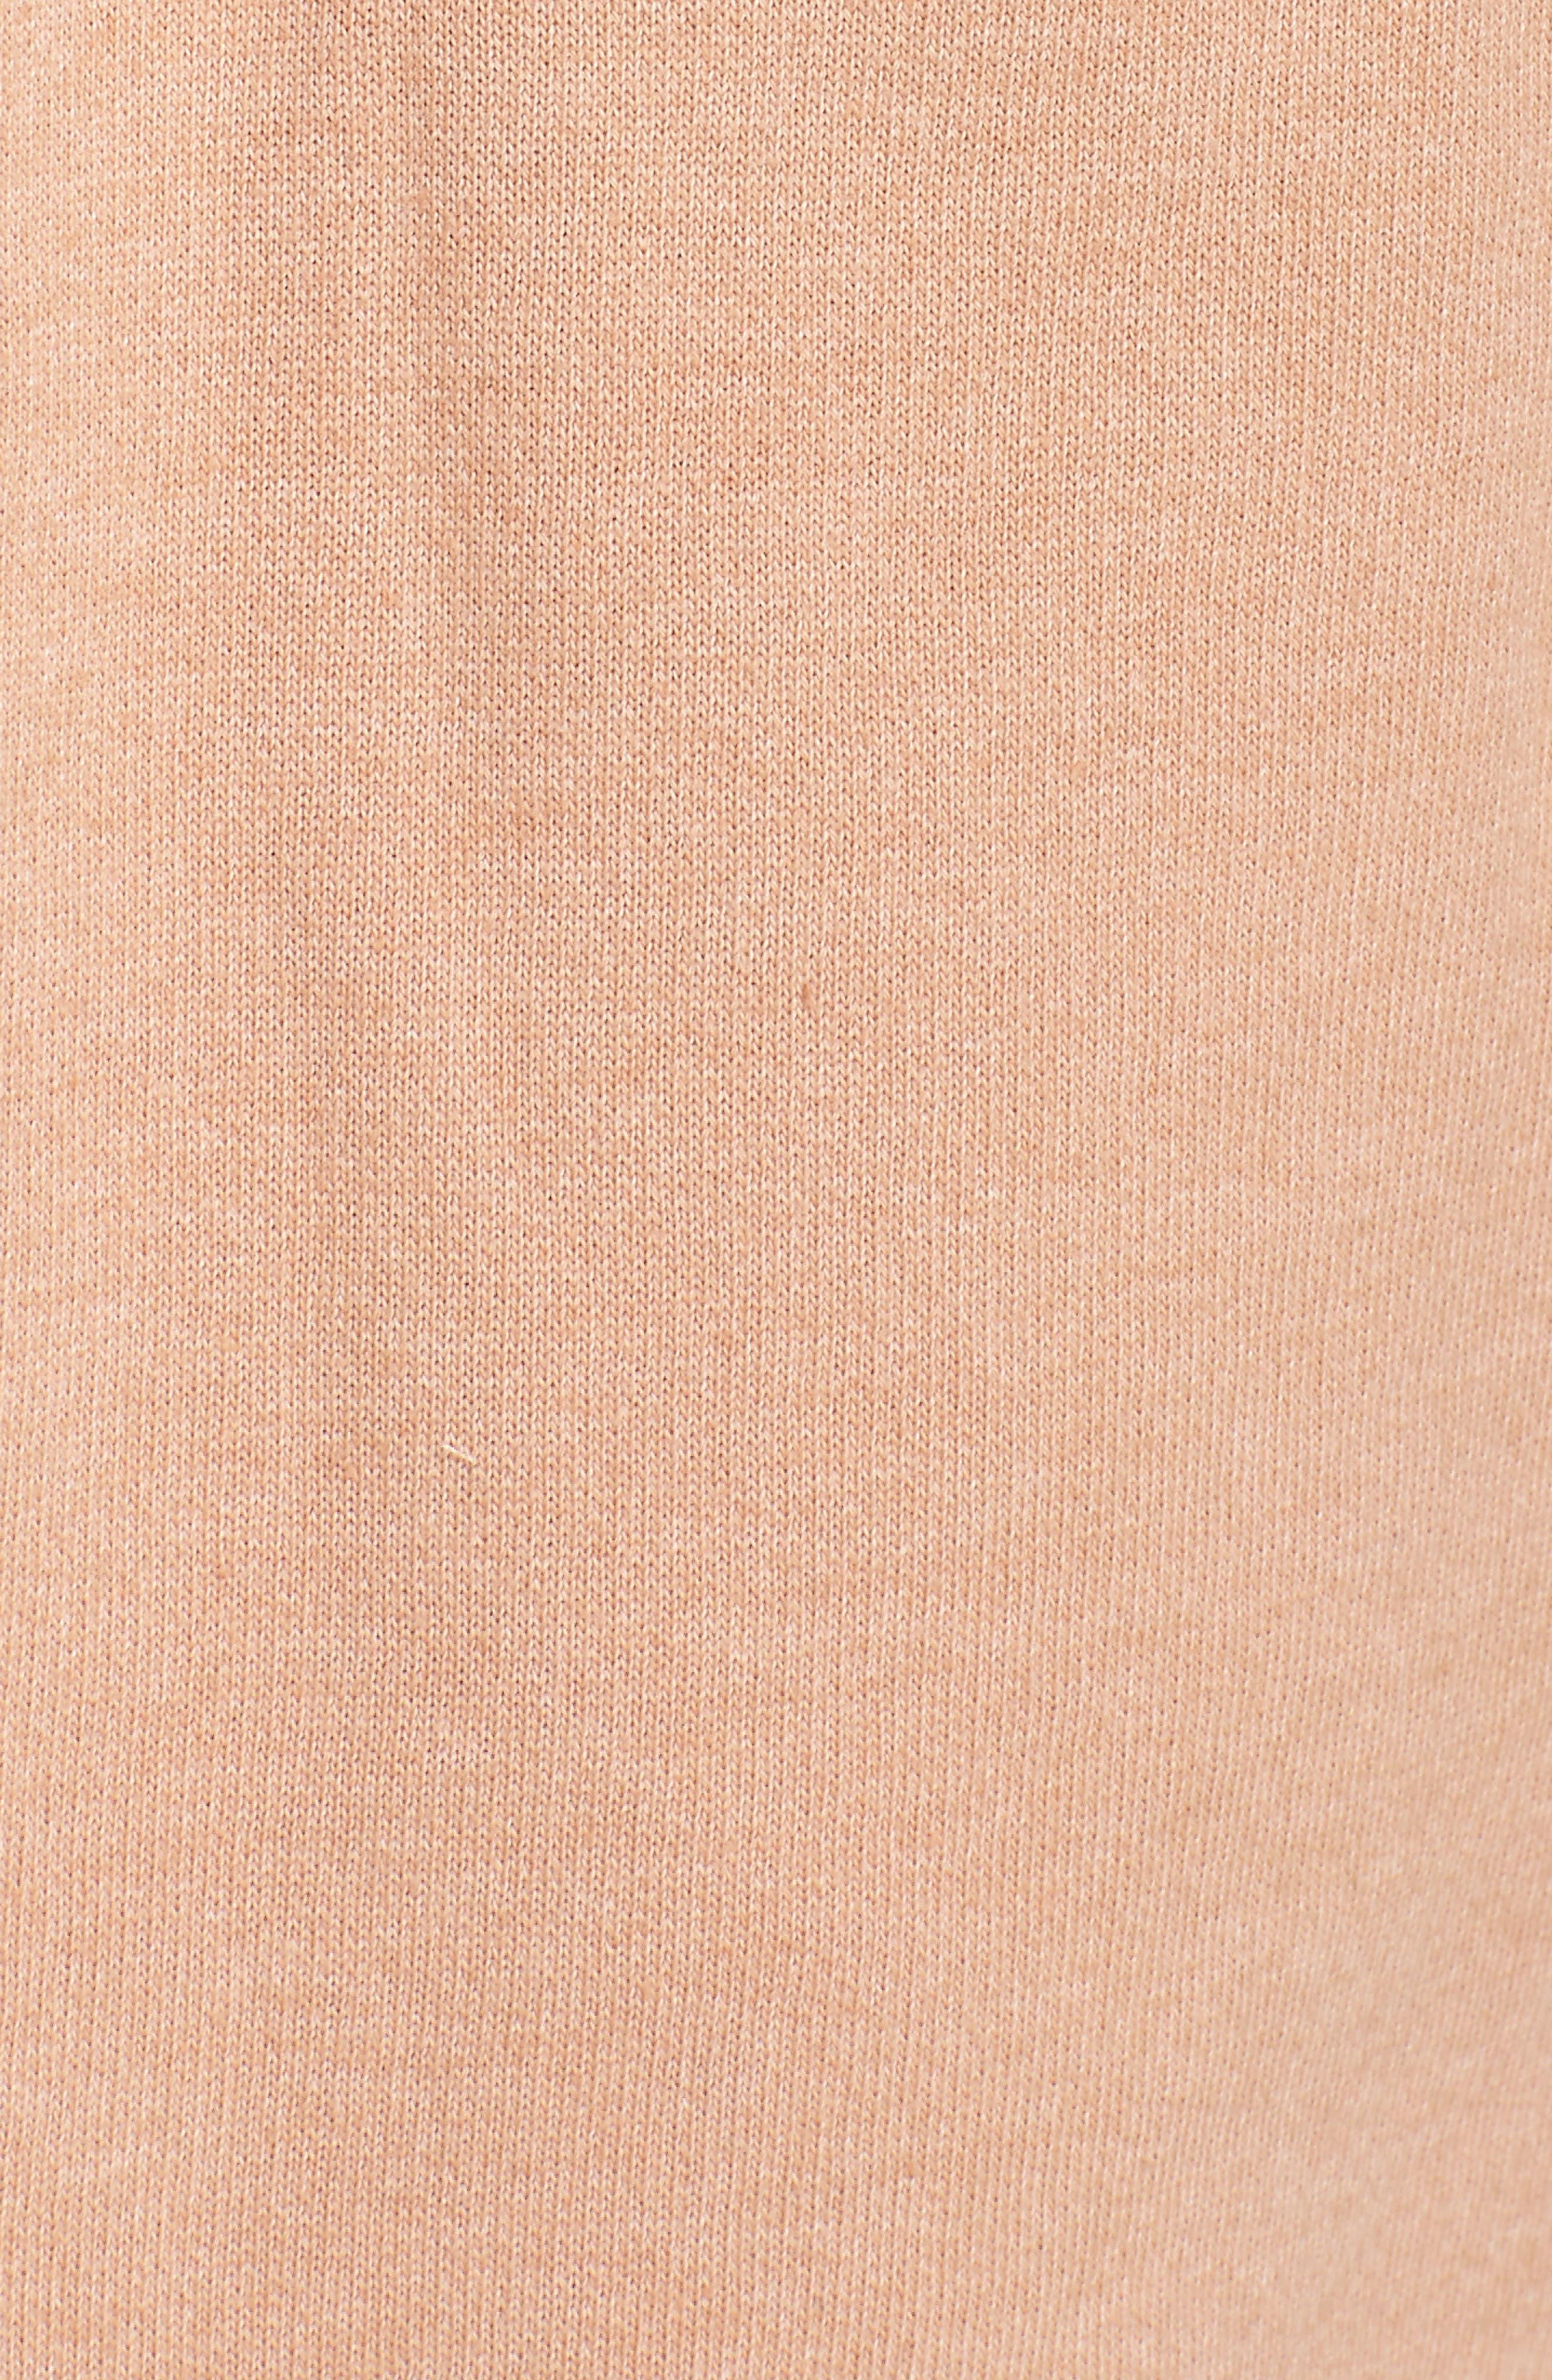 Brunette Jogger Pants,                             Alternate thumbnail 5, color,                             Rose